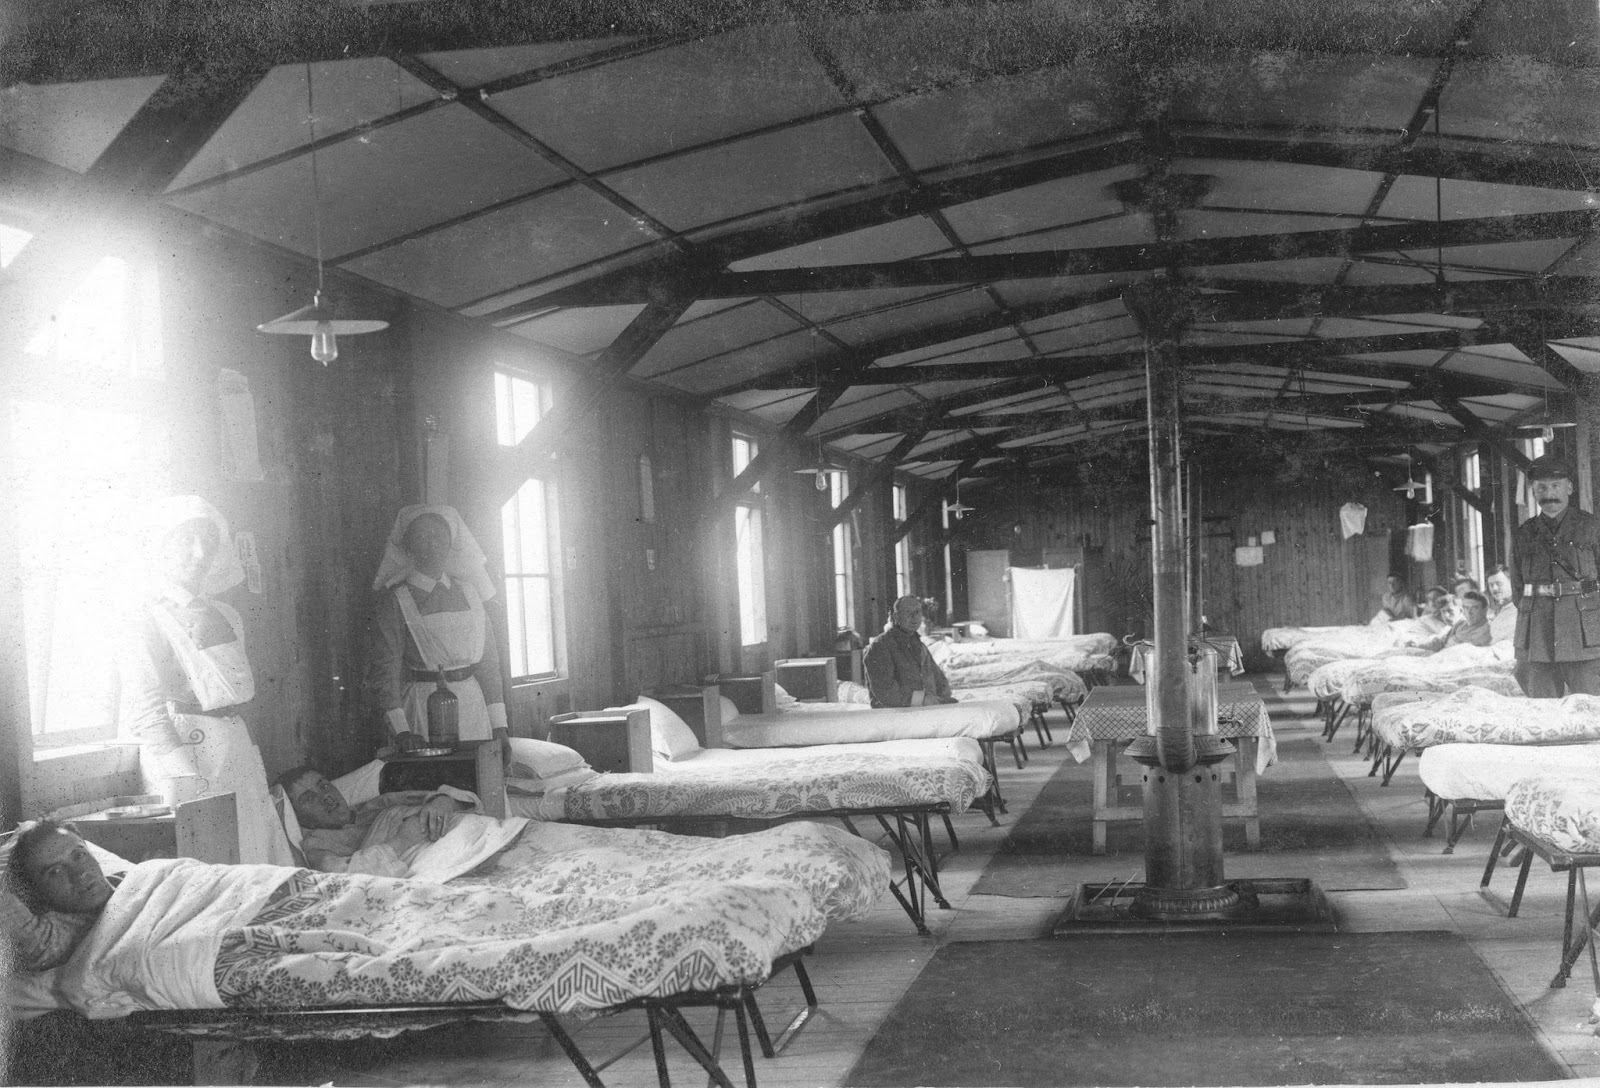 Nursing Sister Philips WW1 Photo Album 14V - The Ward